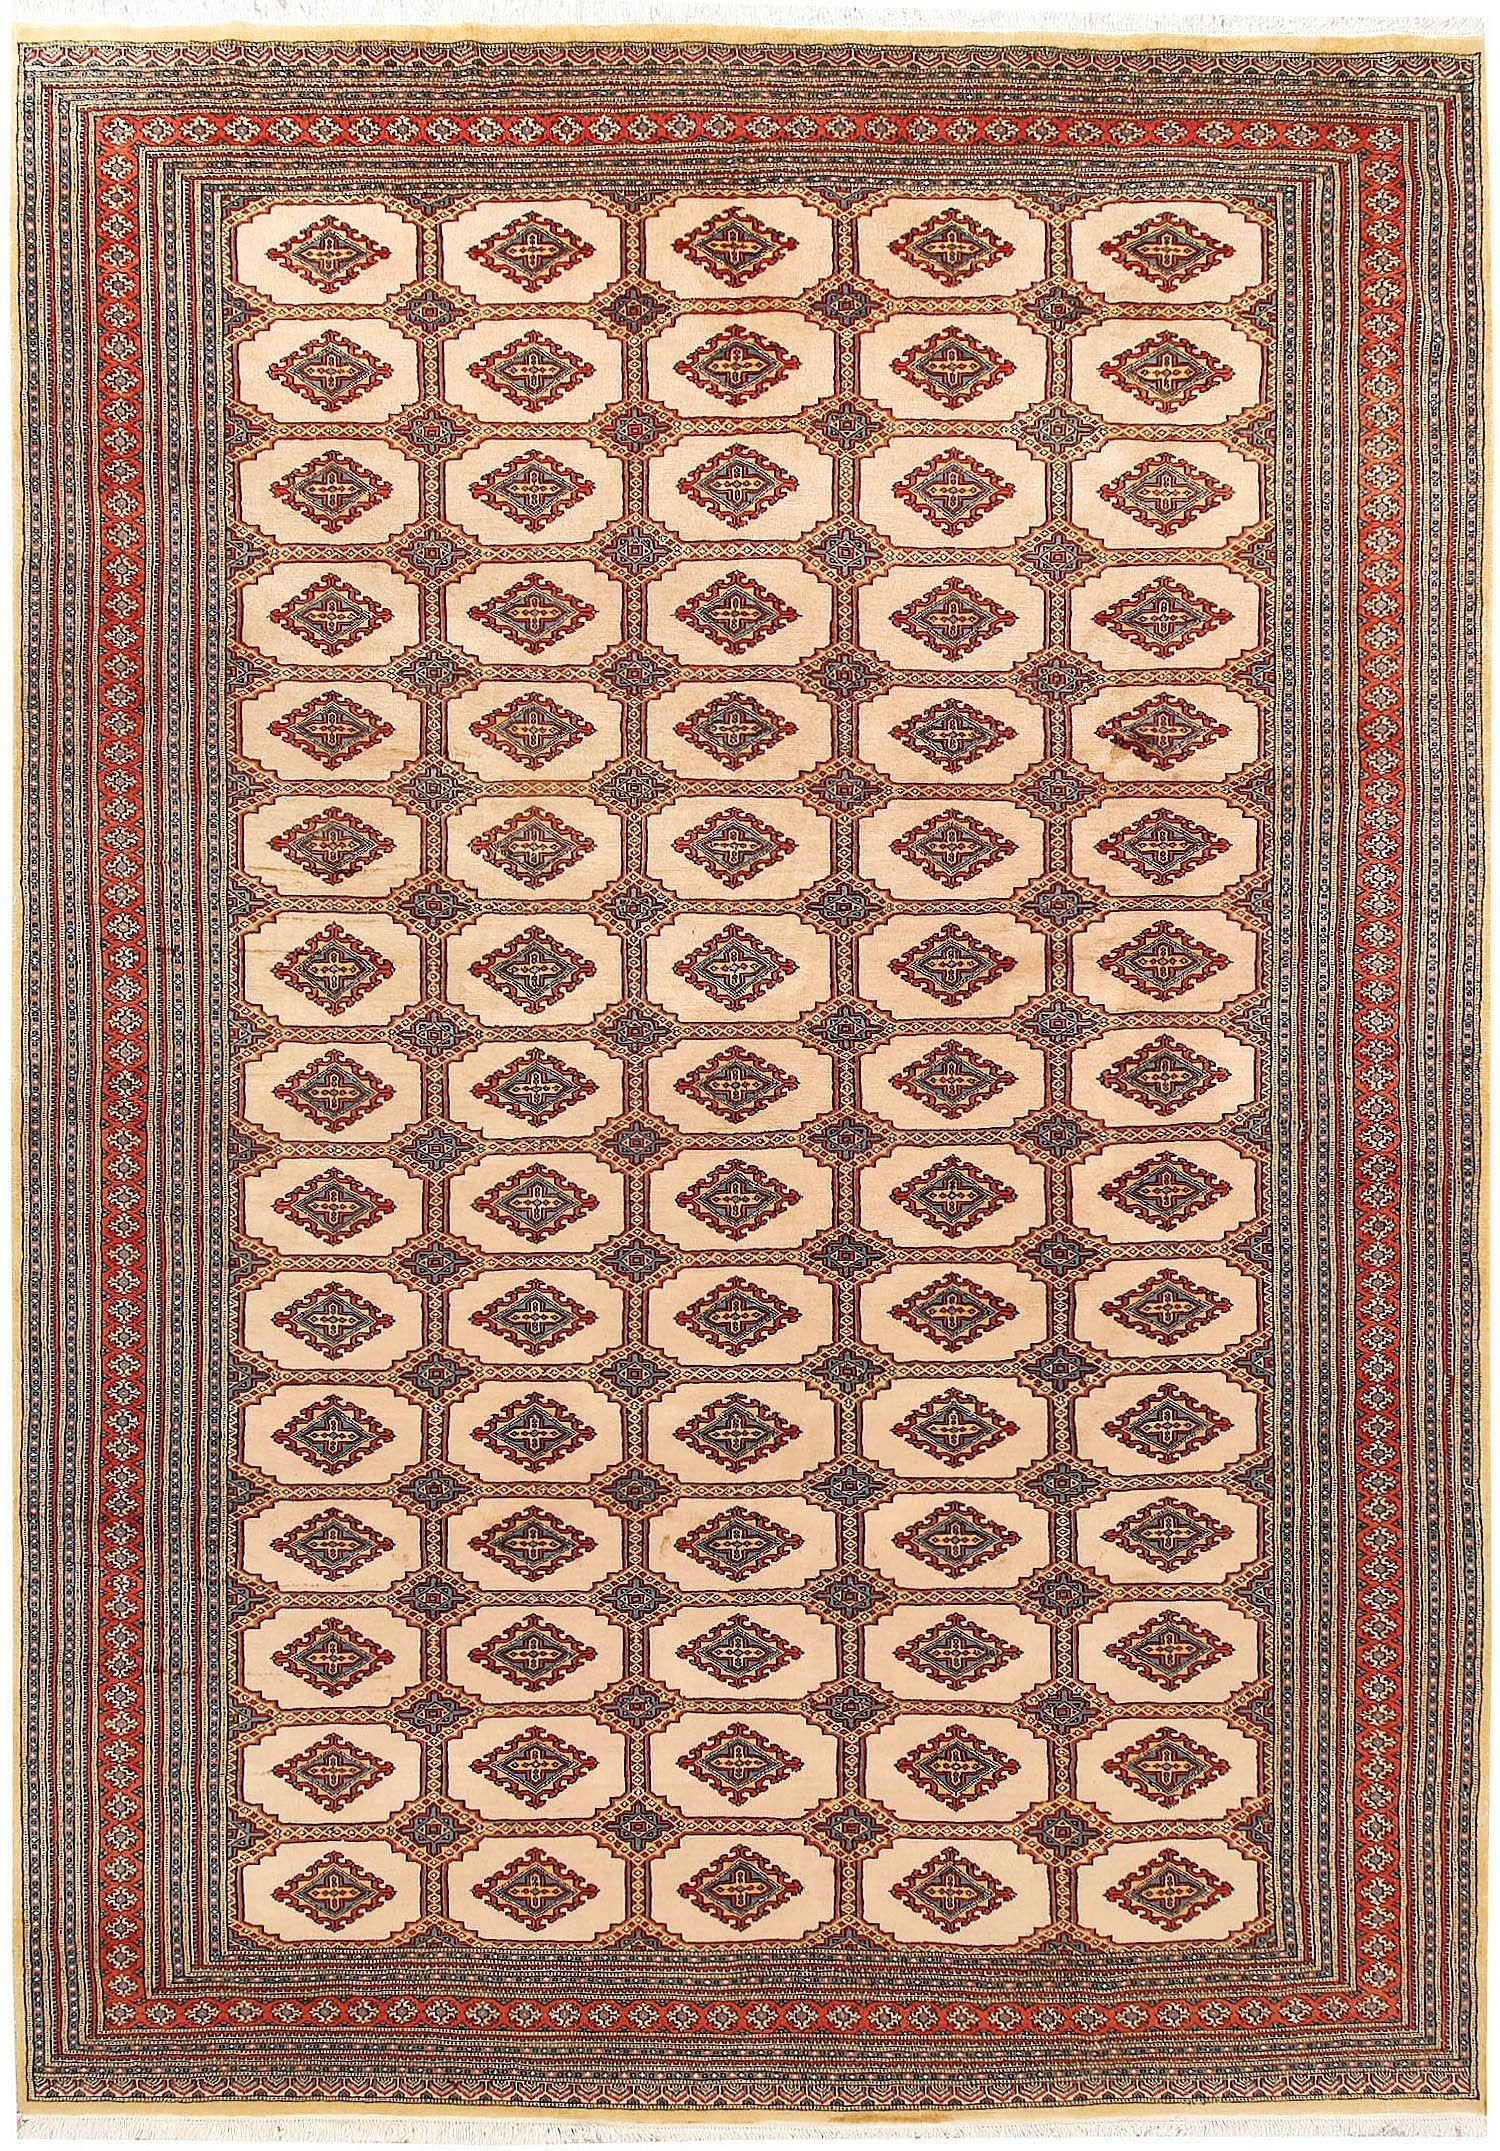 Buy Bisque Jaldar 8 X 11 Rectangle Rugs On Sale In 2020 Oriental Rug Rugs Colorful Rugs